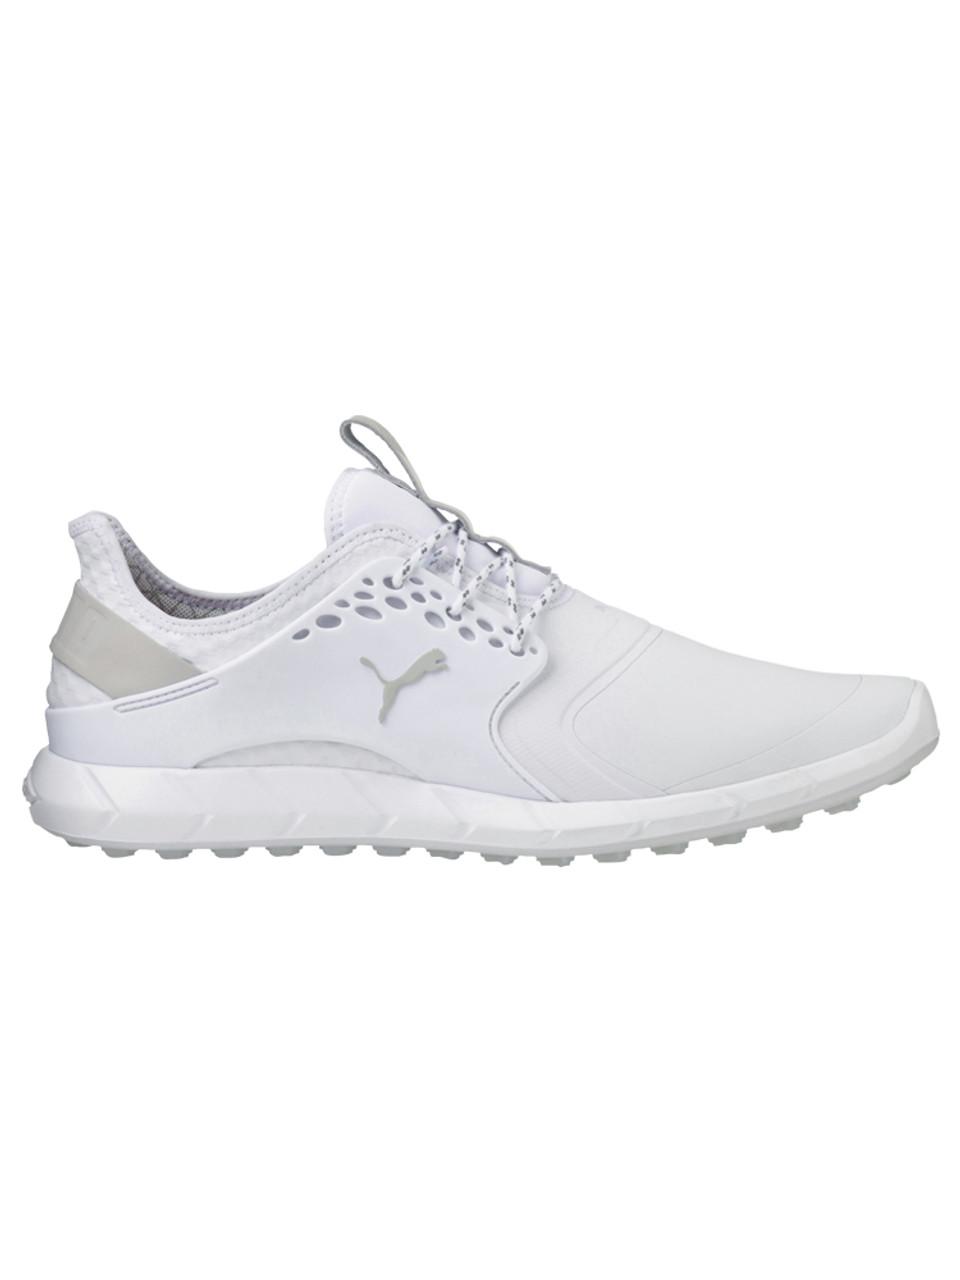 Puma Ignite PWRsport Pro Shoes Puma White